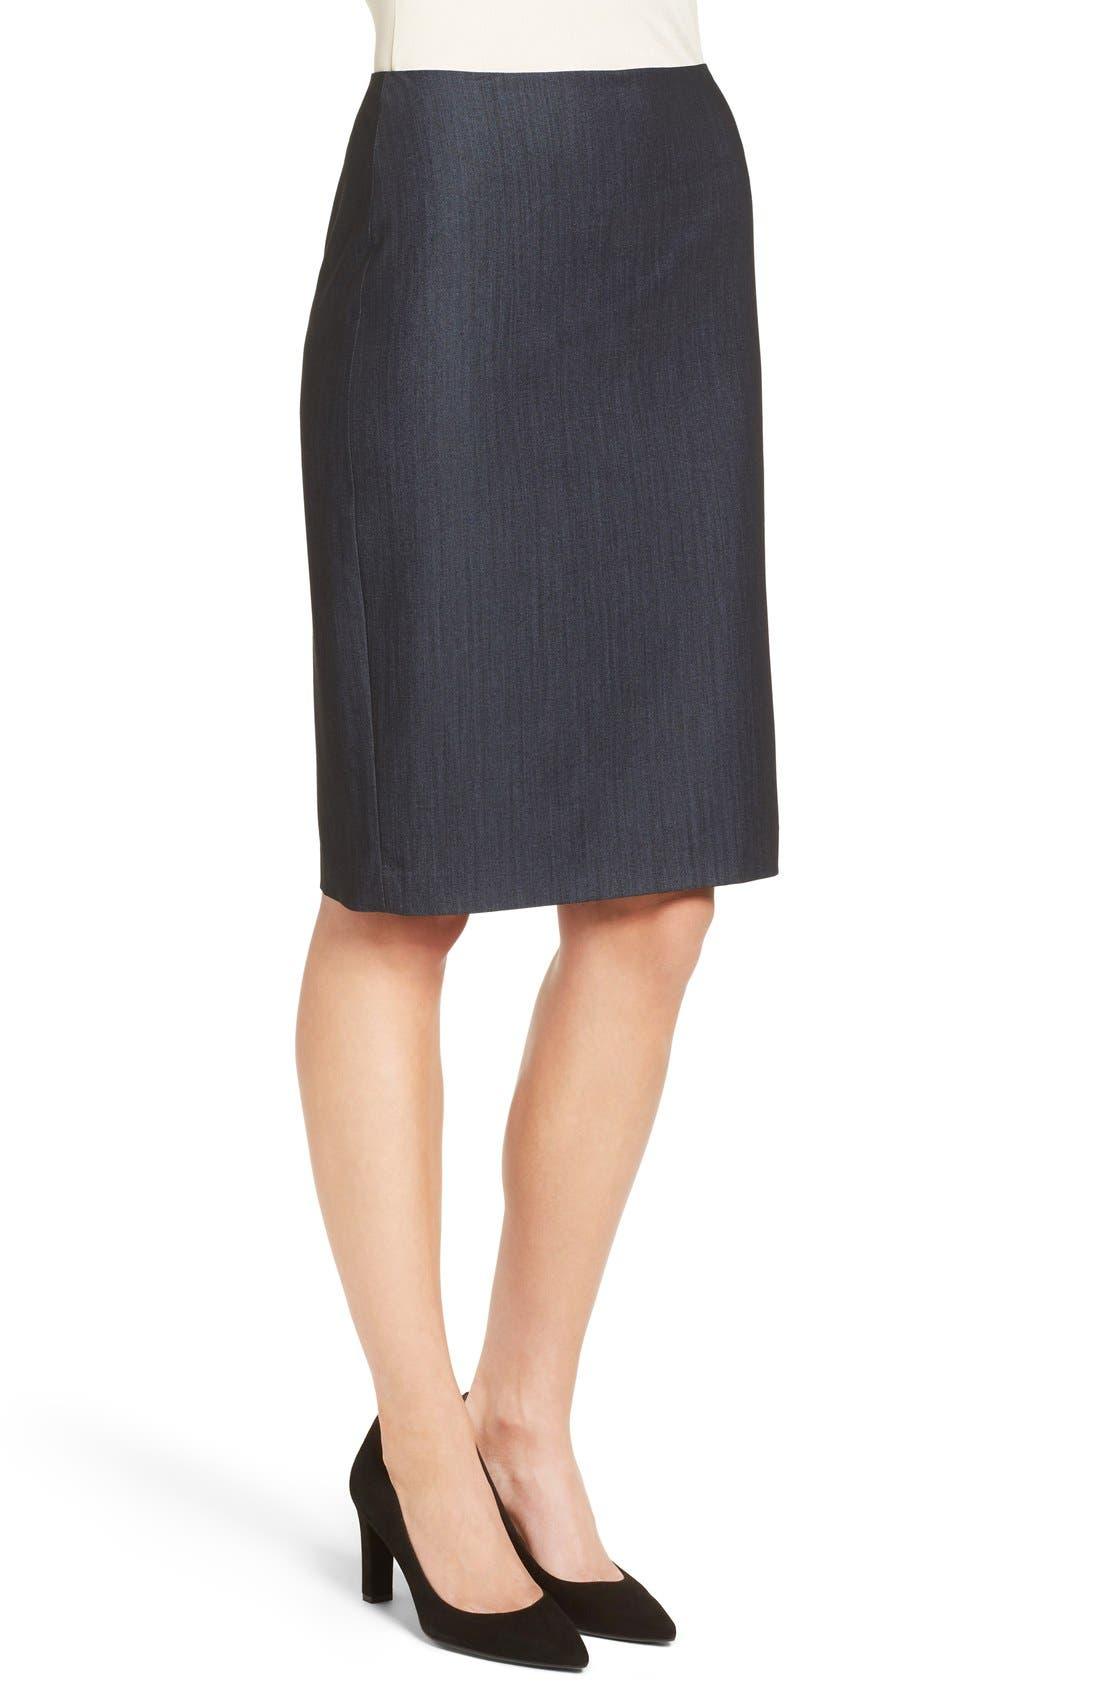 ANNE KLEIN, Stretch Woven Suit Skirt, Alternate thumbnail 5, color, INDIGO TWILL